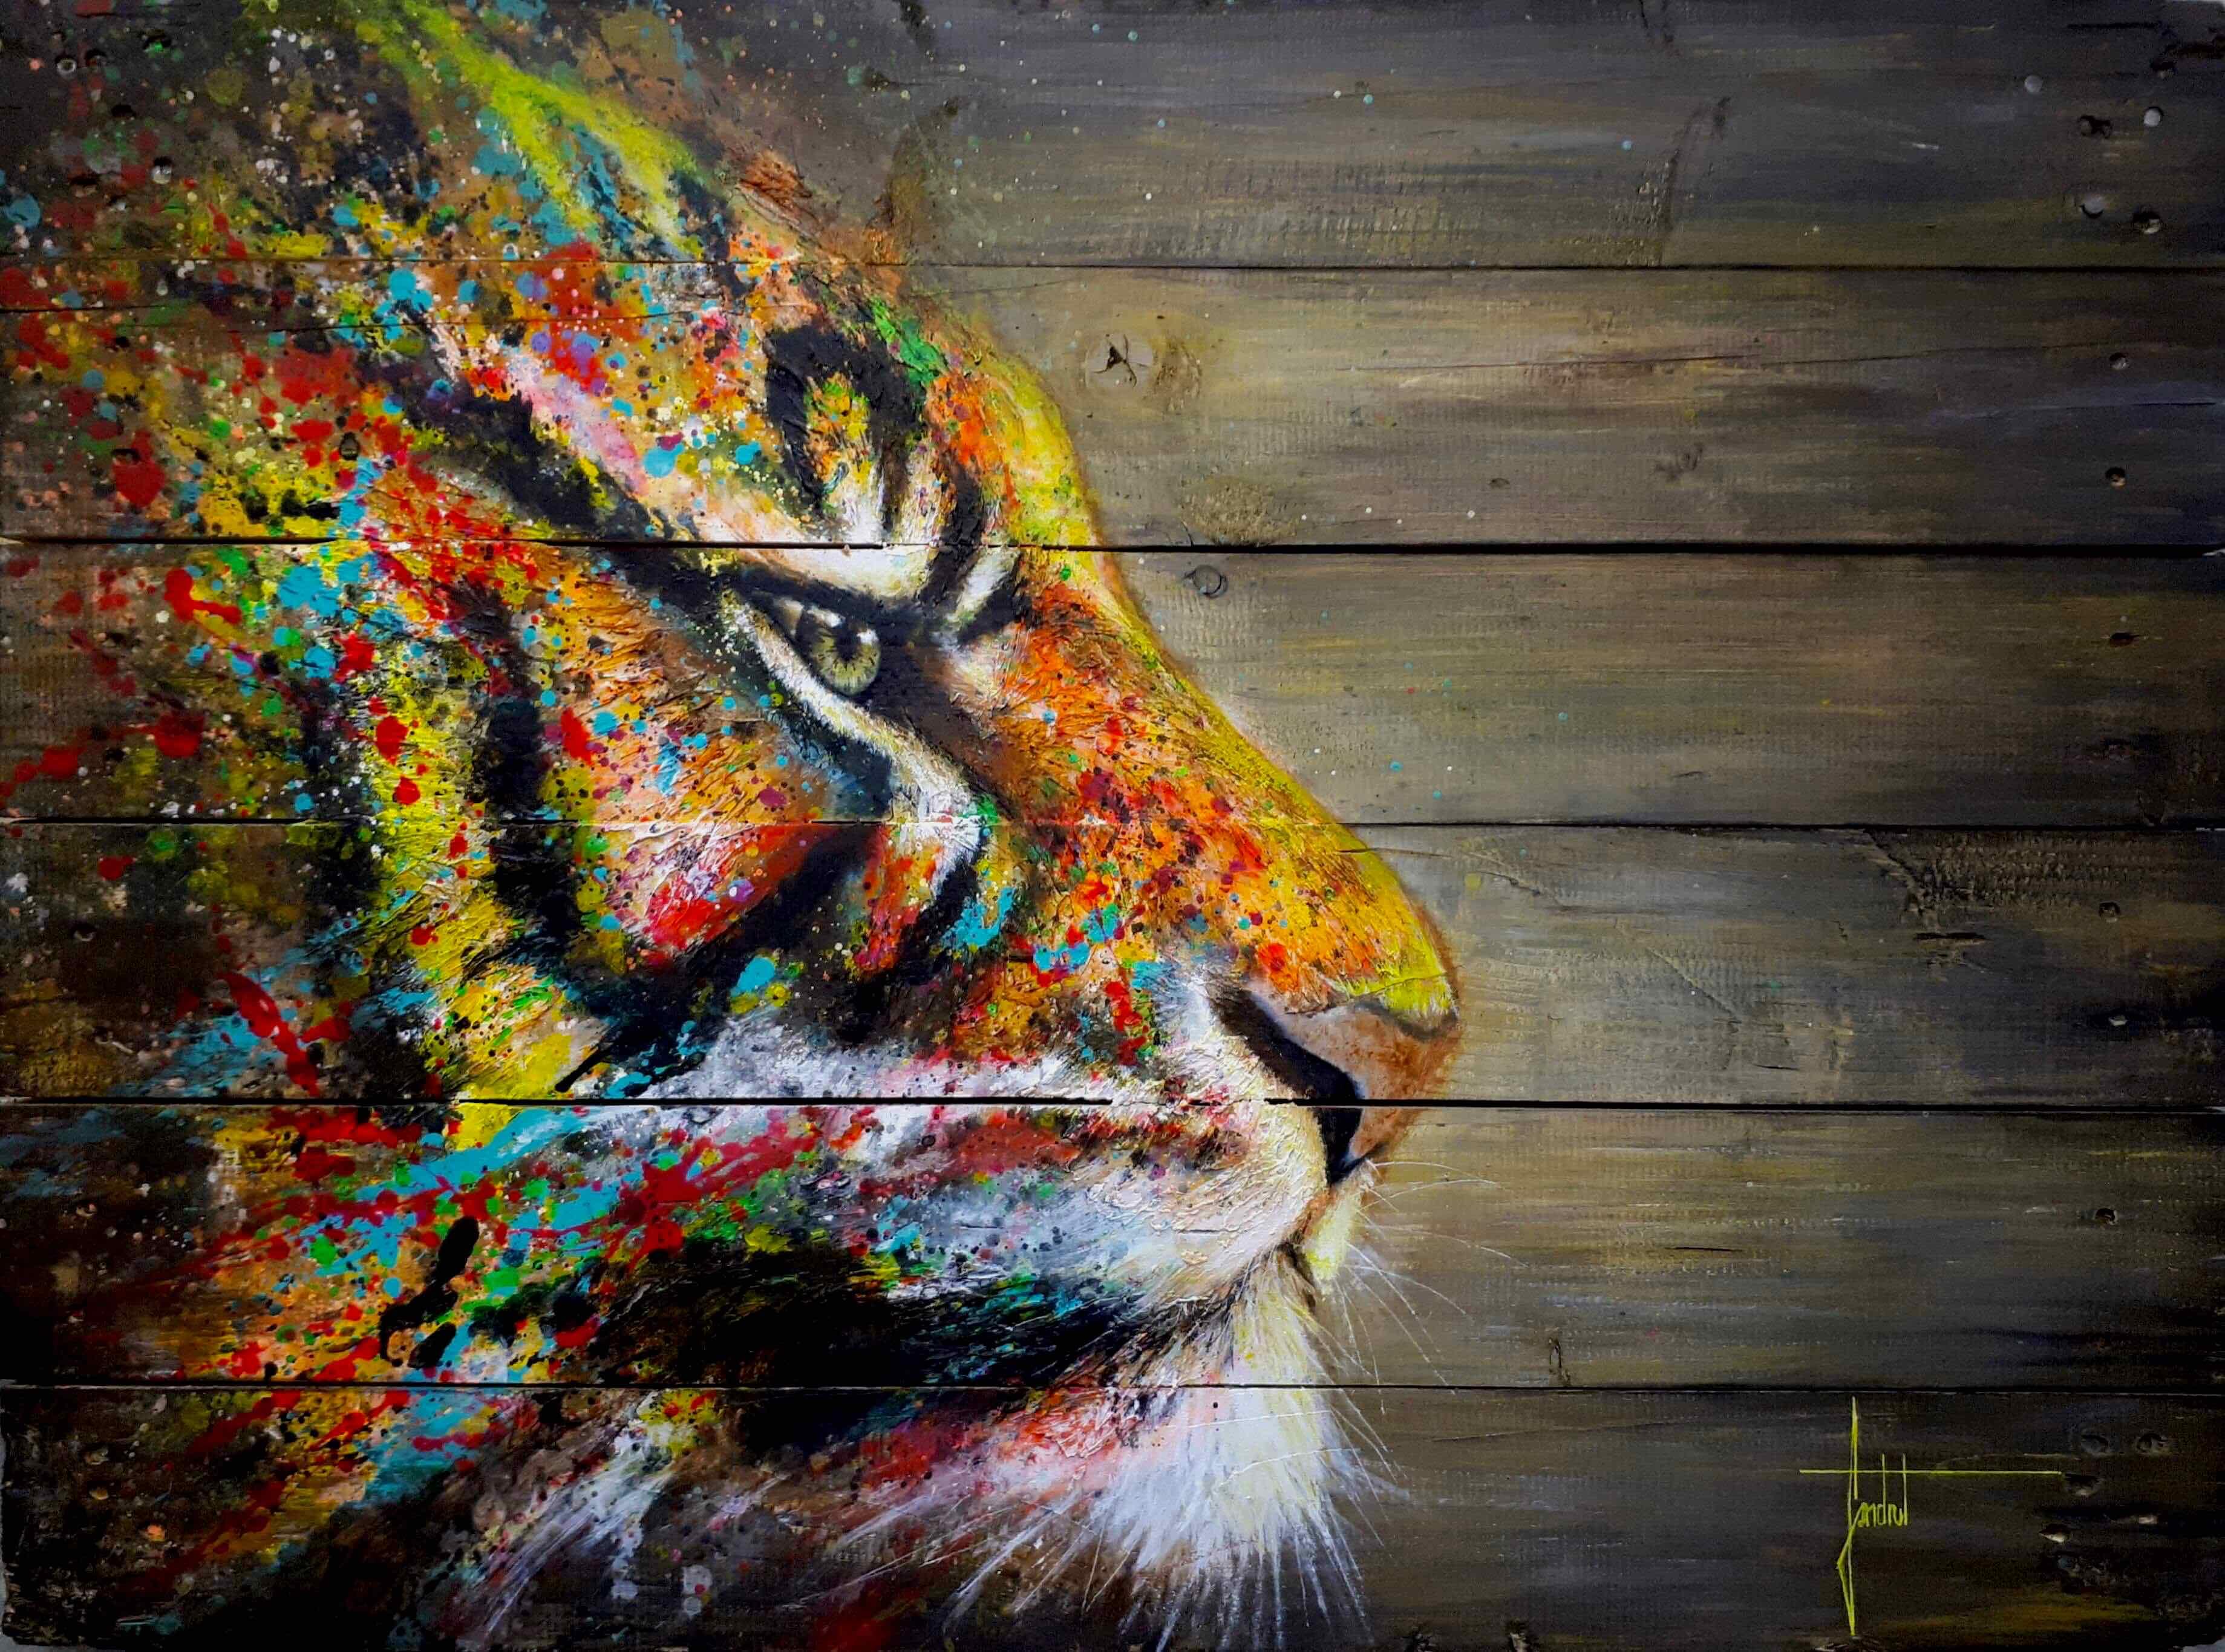 SANDROT le Tigre